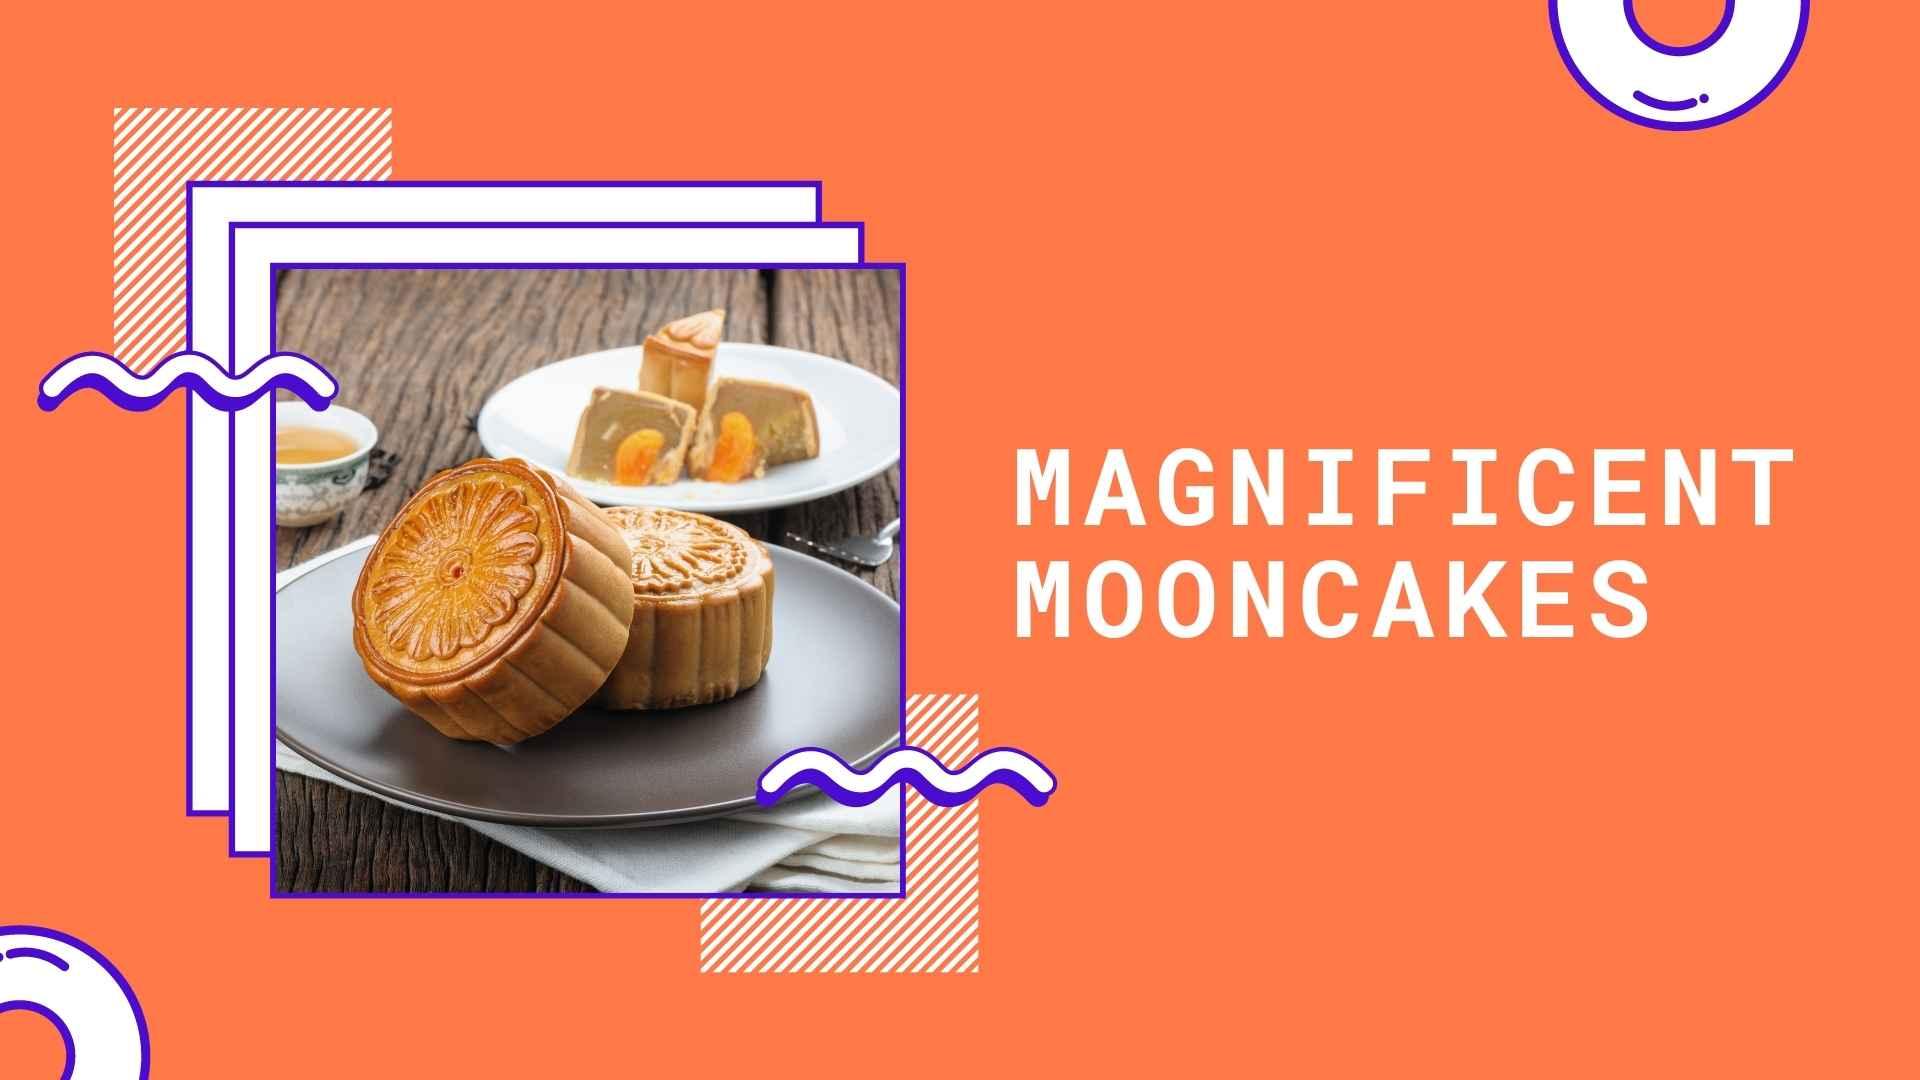 magnificent mooncakes